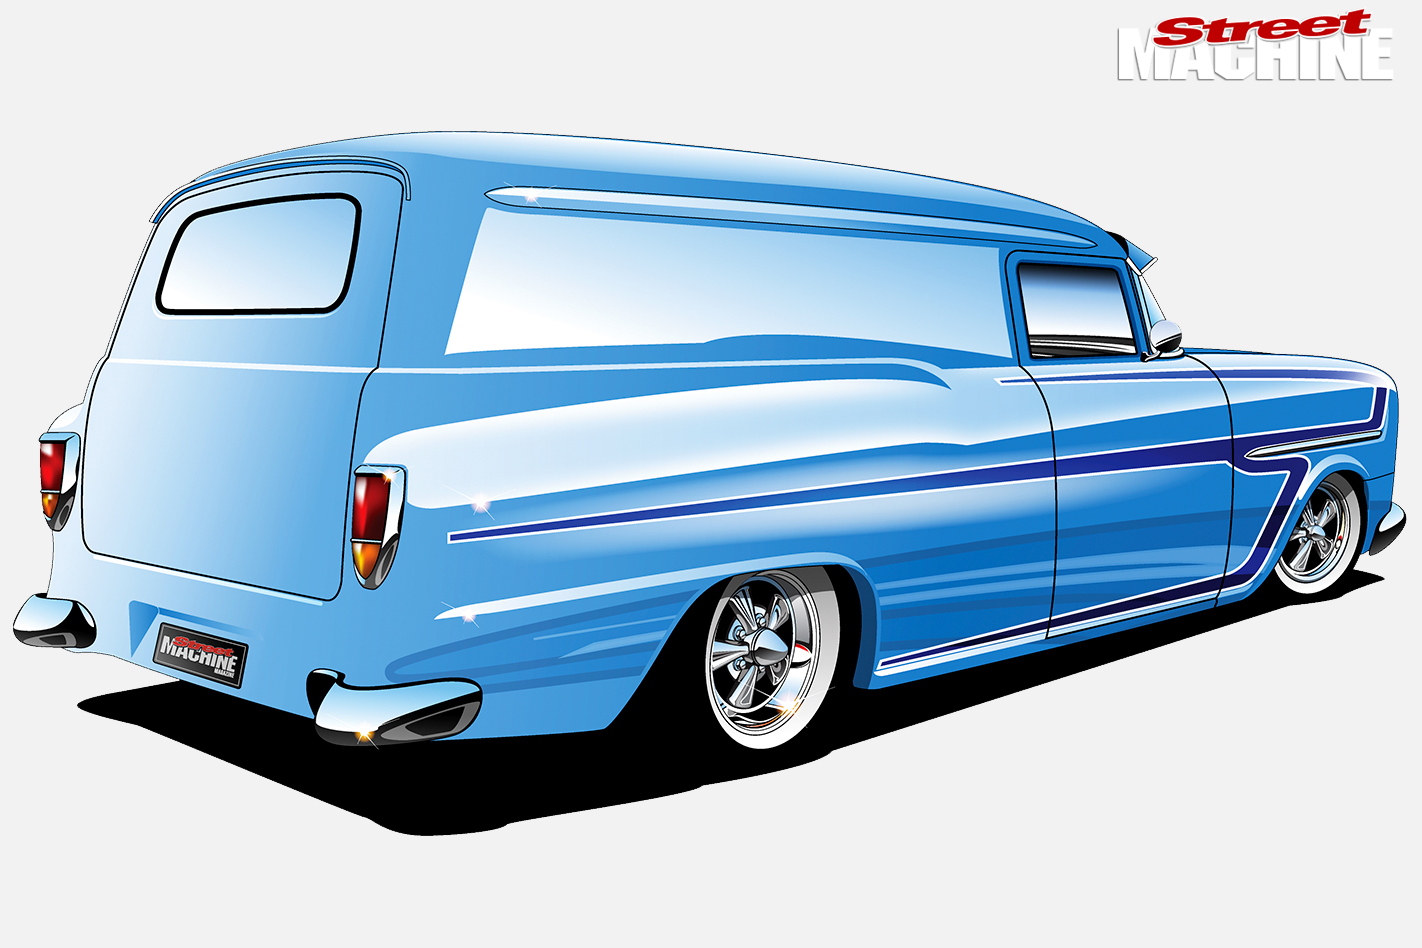 Holden -FB-van -design -rear